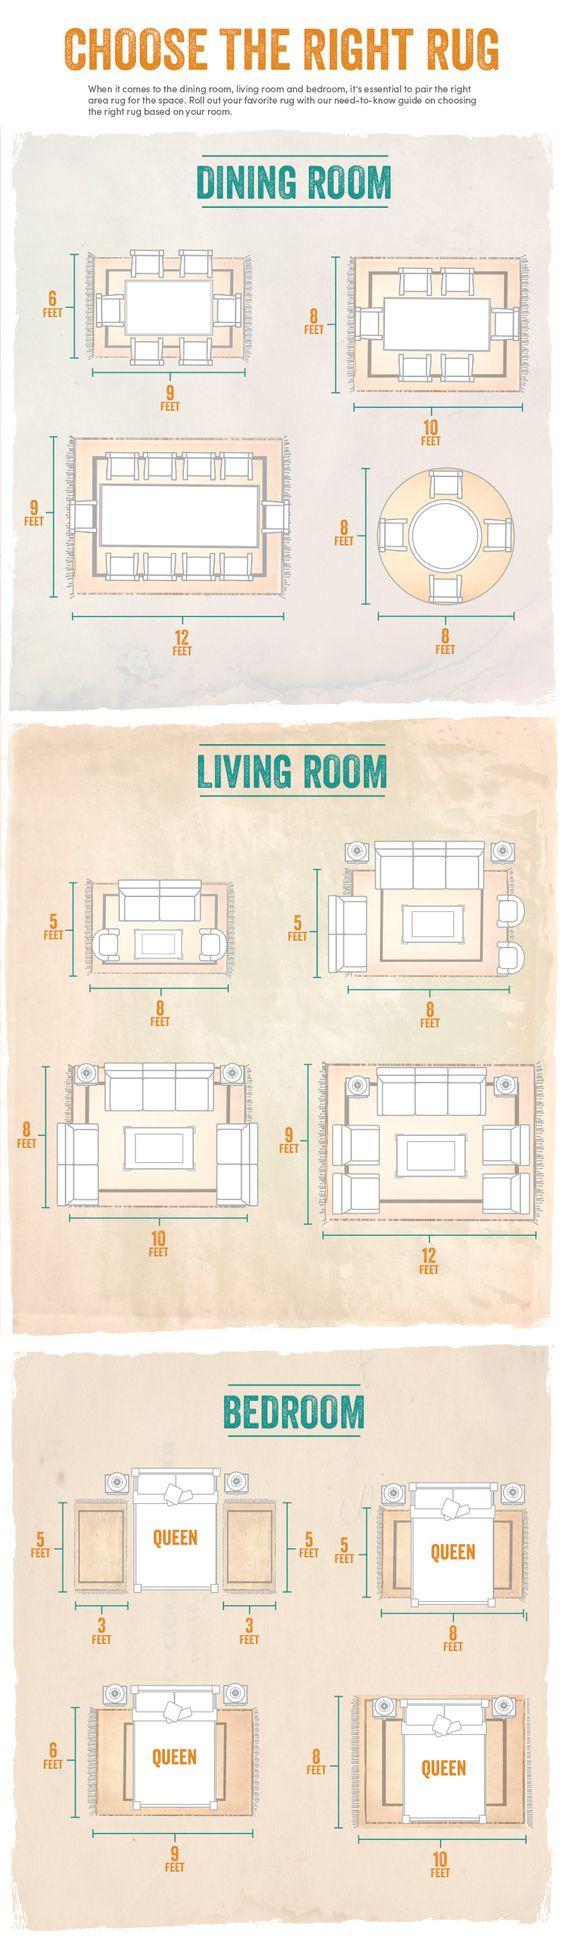 Platzbedarf diverser Möbel